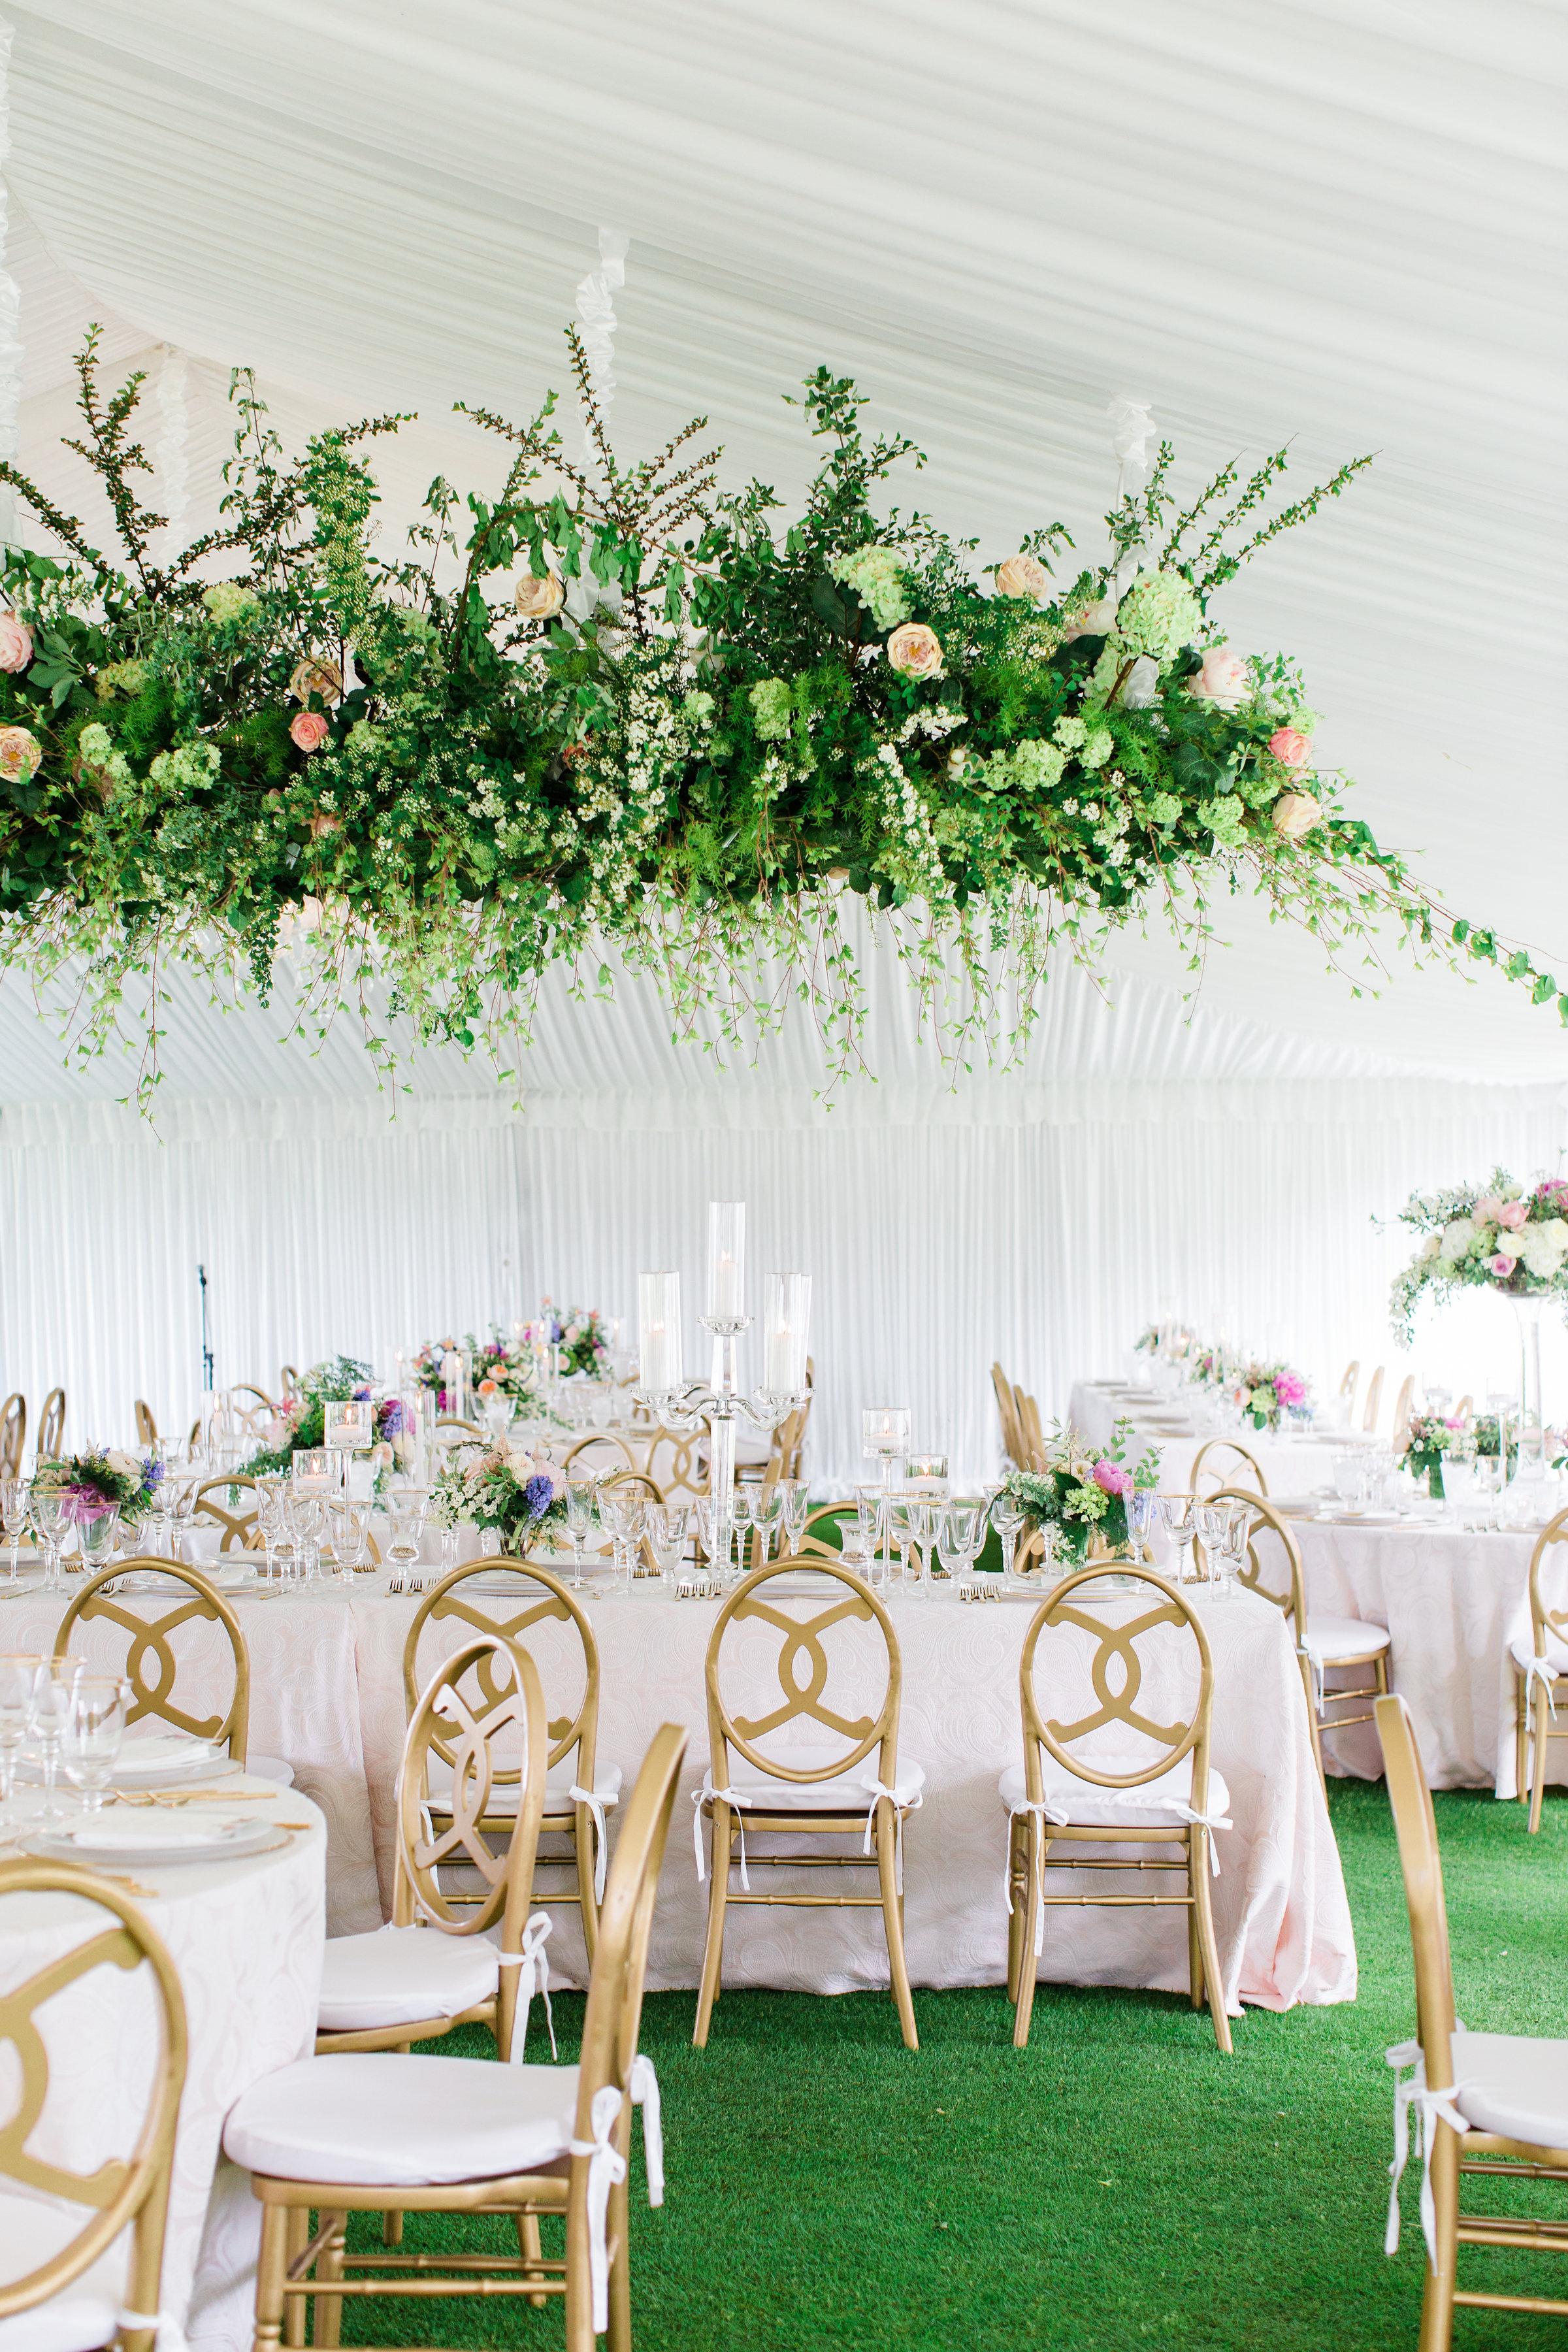 Coffman+Wedding+Reception+Details-46.jpg